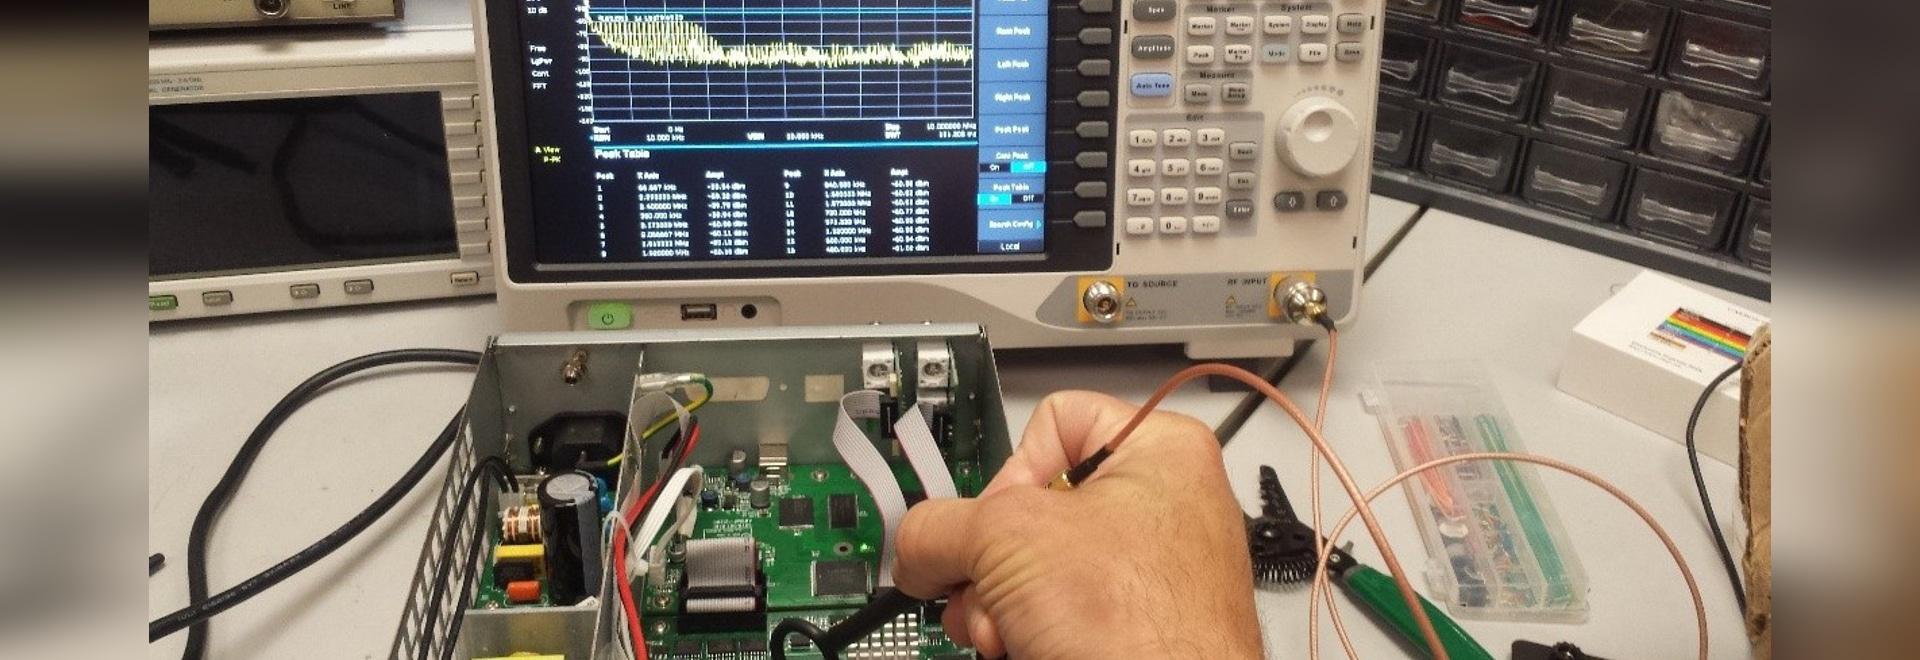 Electromagnetic Compliance Pre Test Basics Shenzhen Electronic Circuit